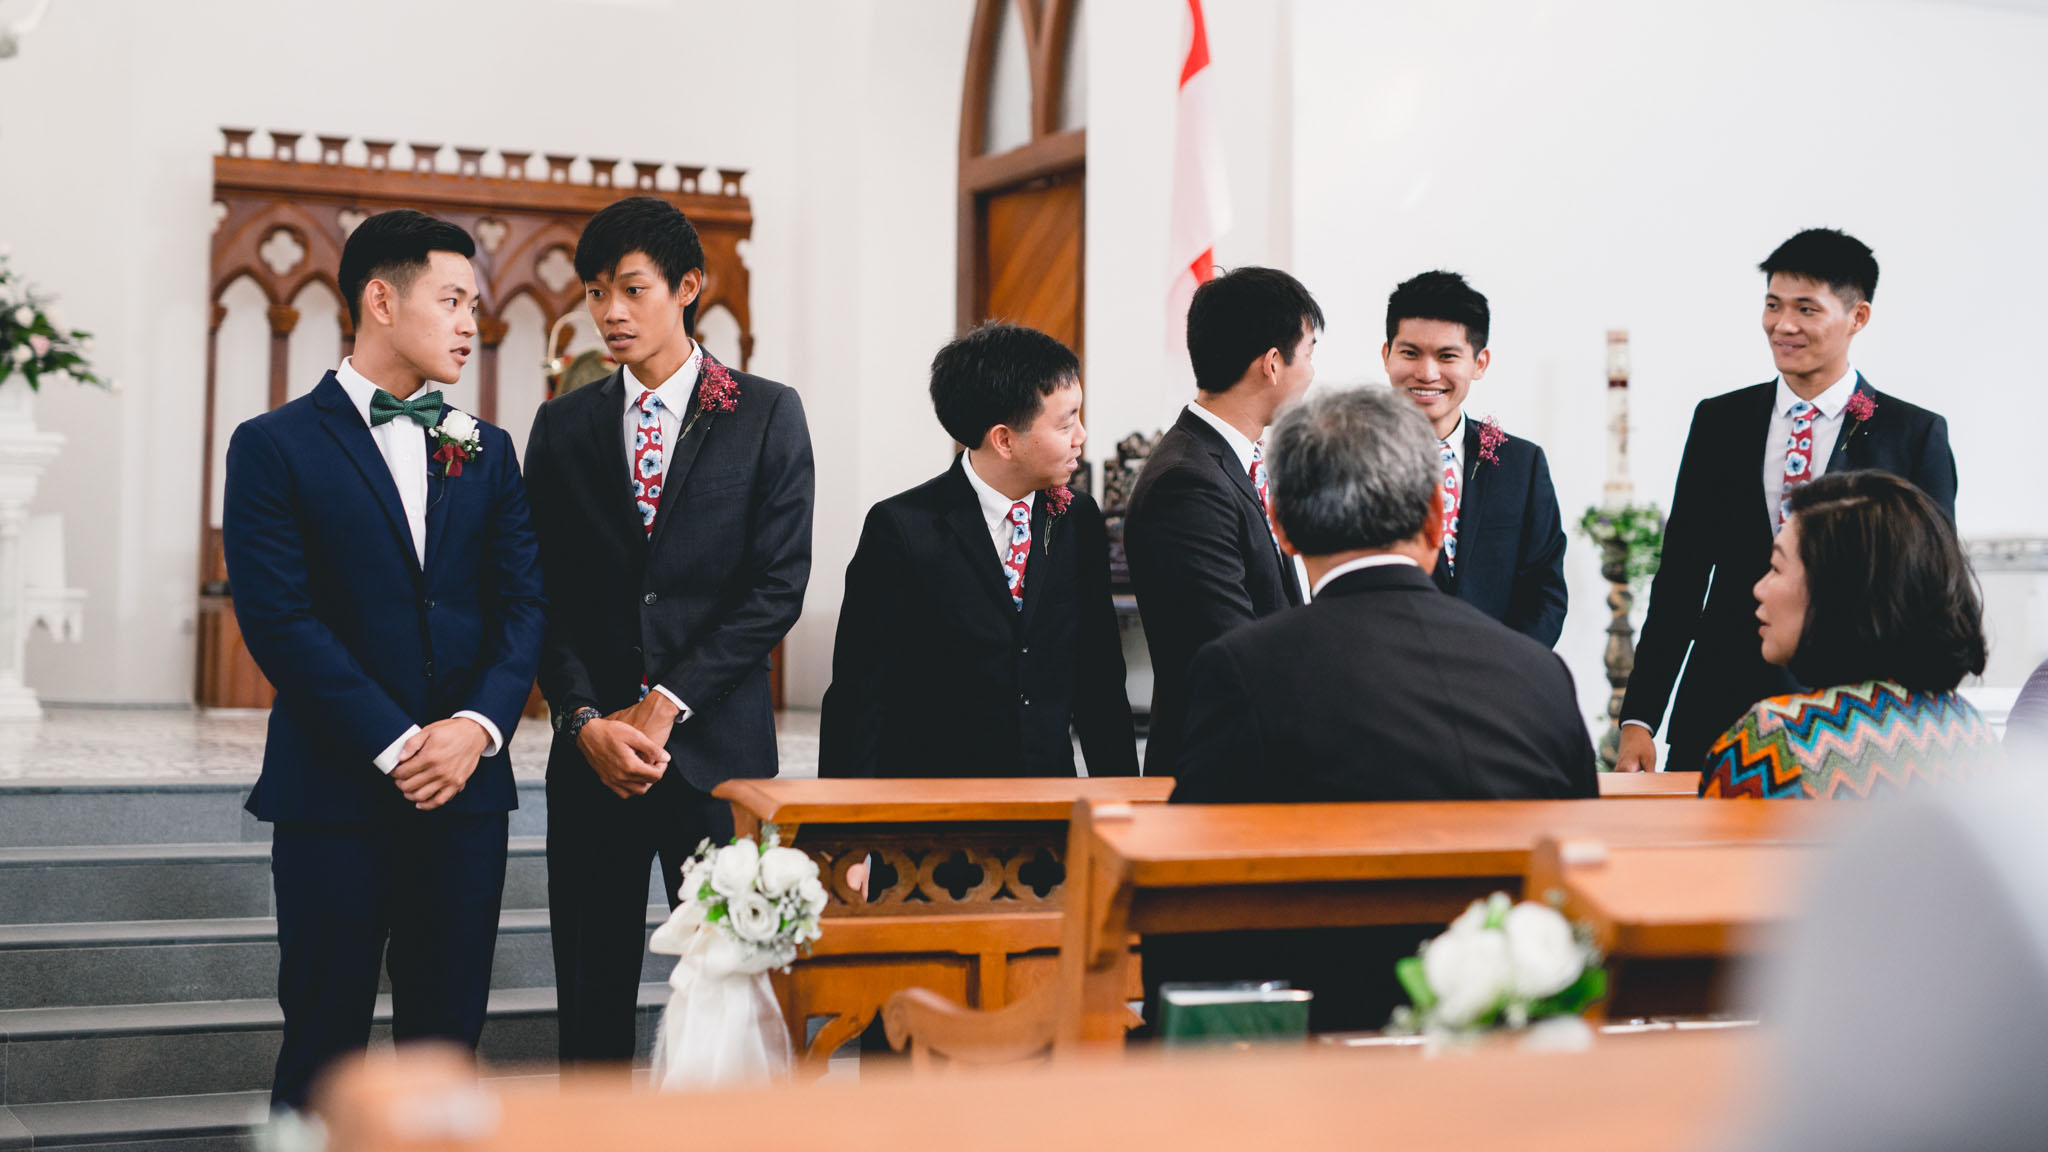 wedding church saints peter and paul 00017.JPG